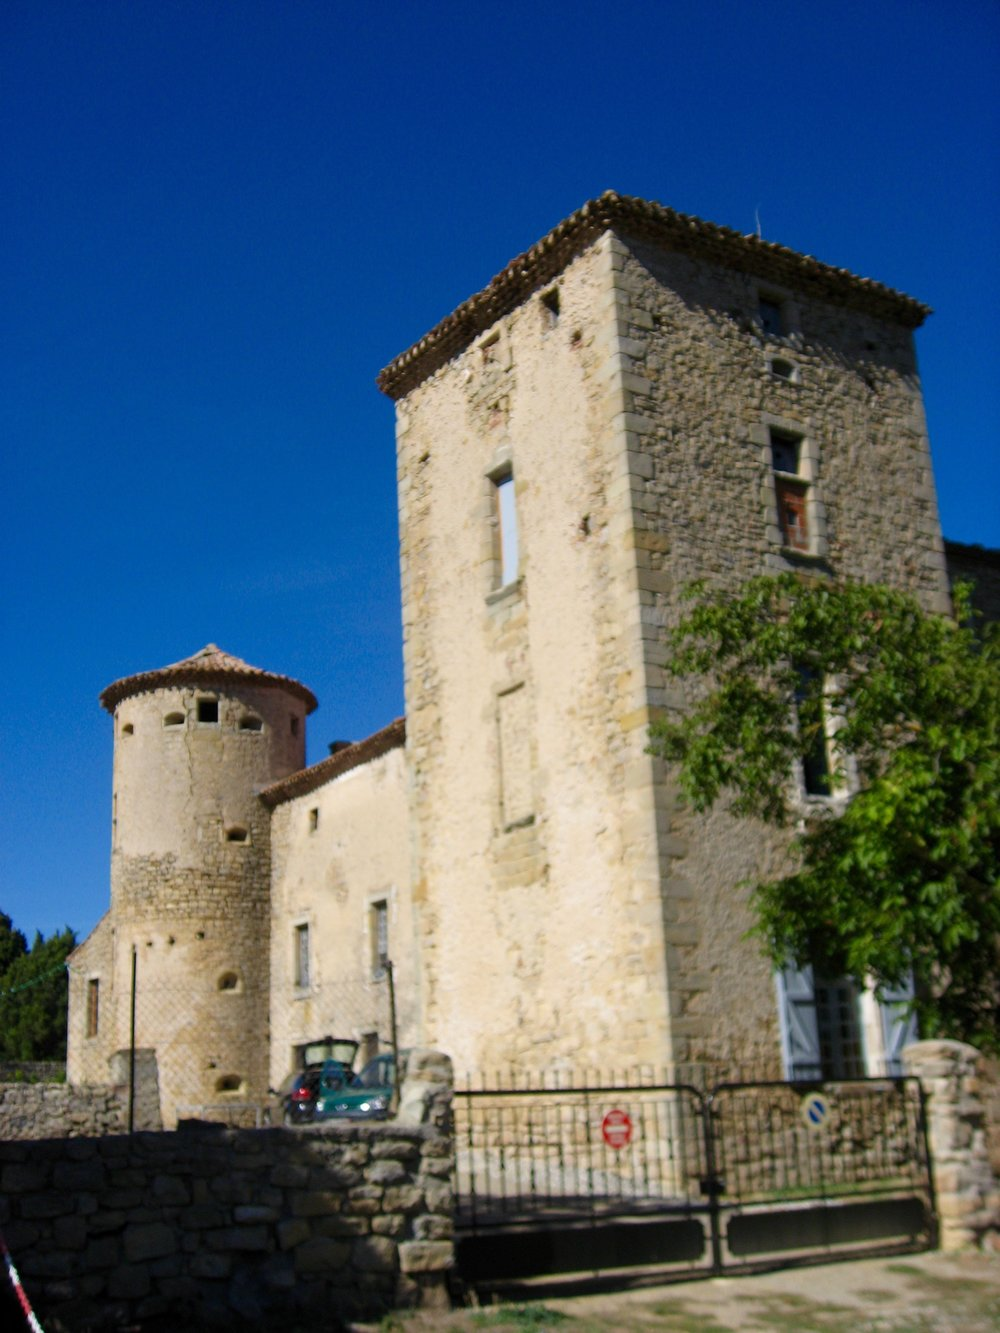 Rennes-le-Château, France - Château.jpg